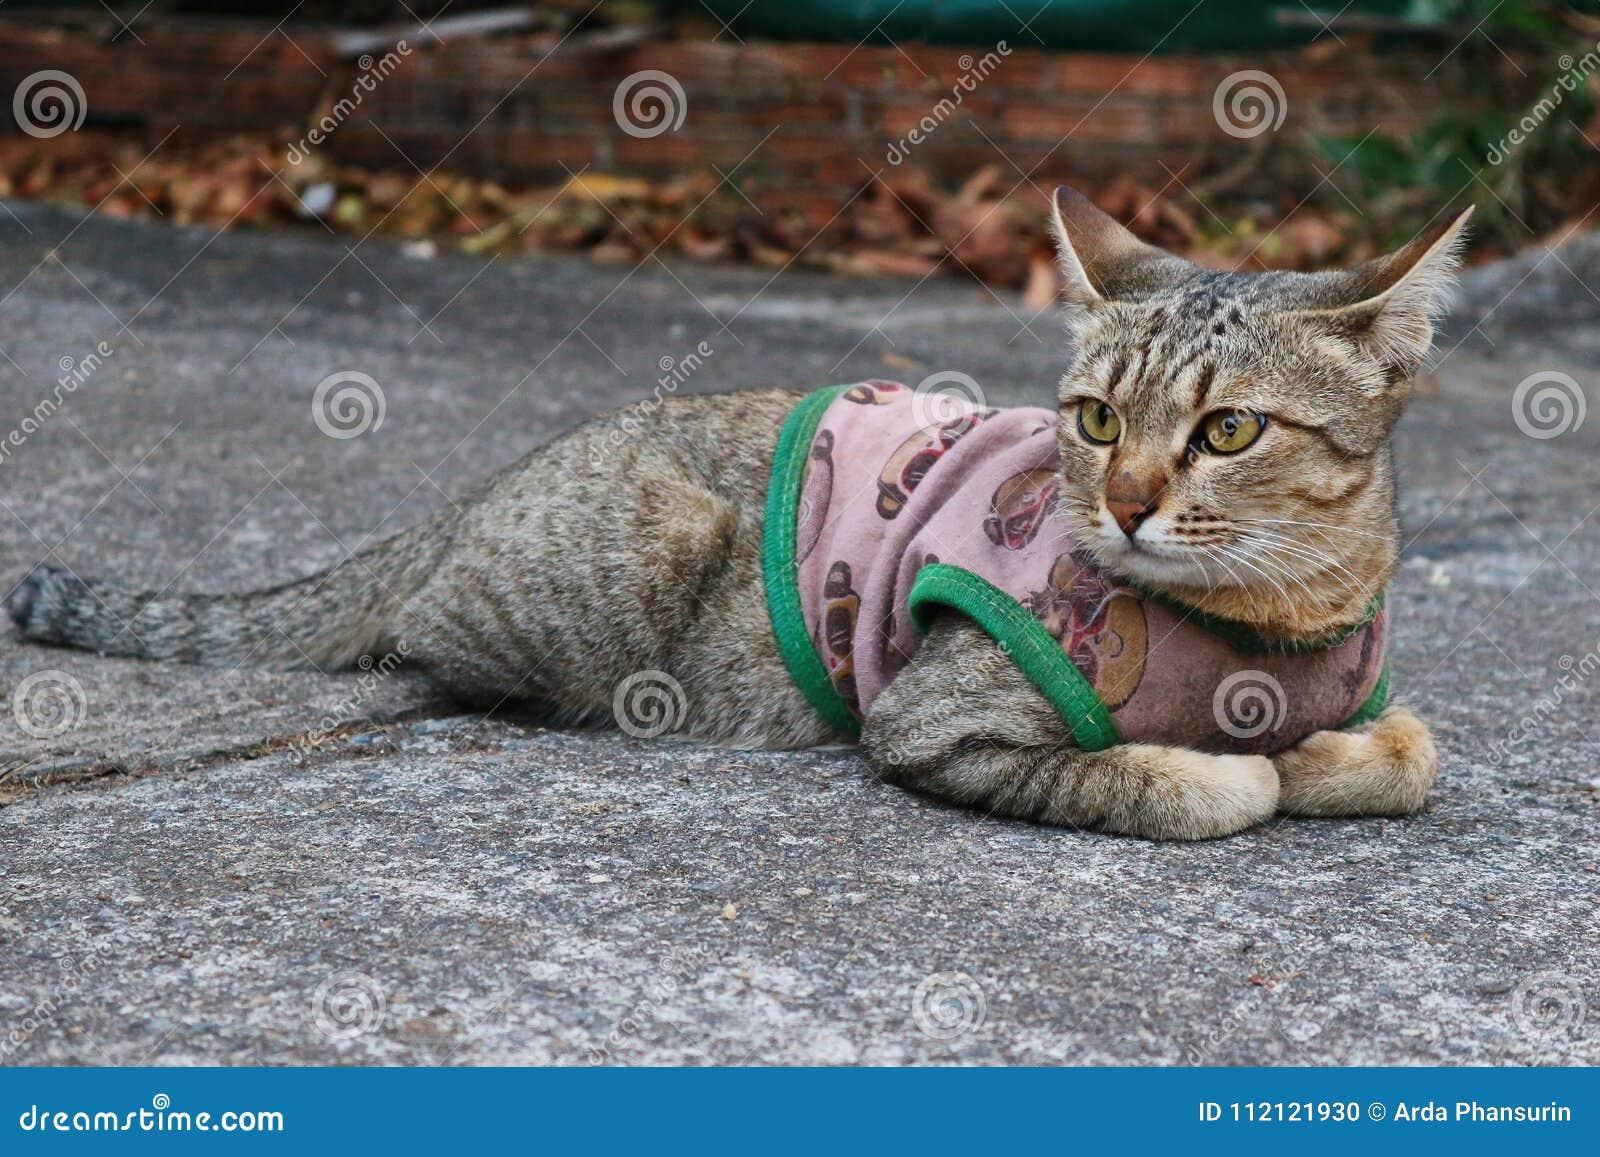 Close Up Image Of A Cute Cat